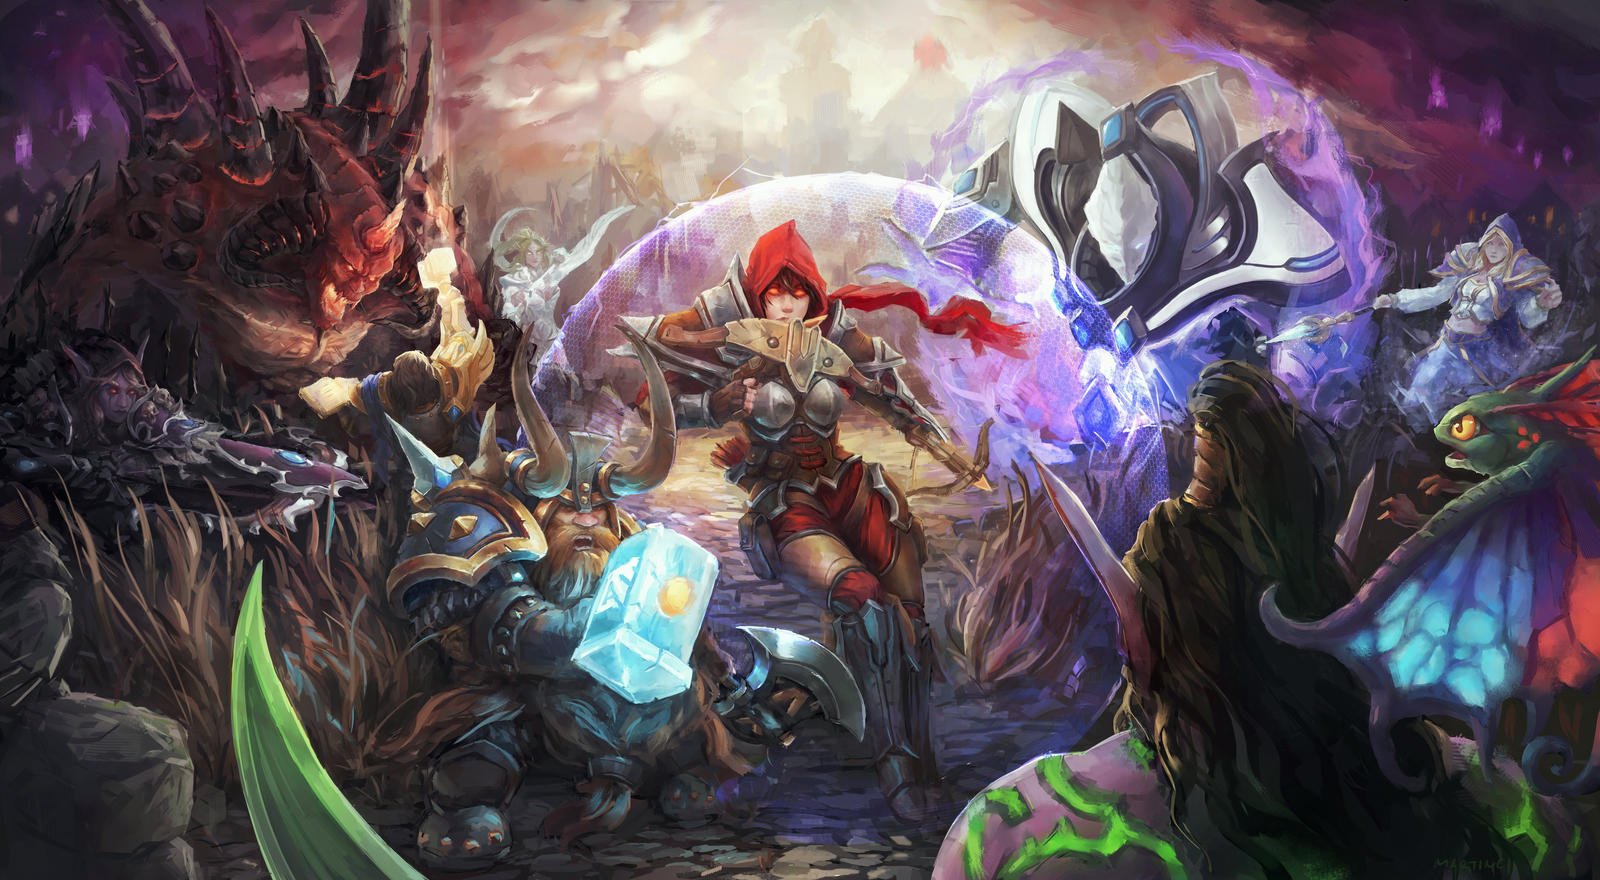 Team Fight by MartinCi